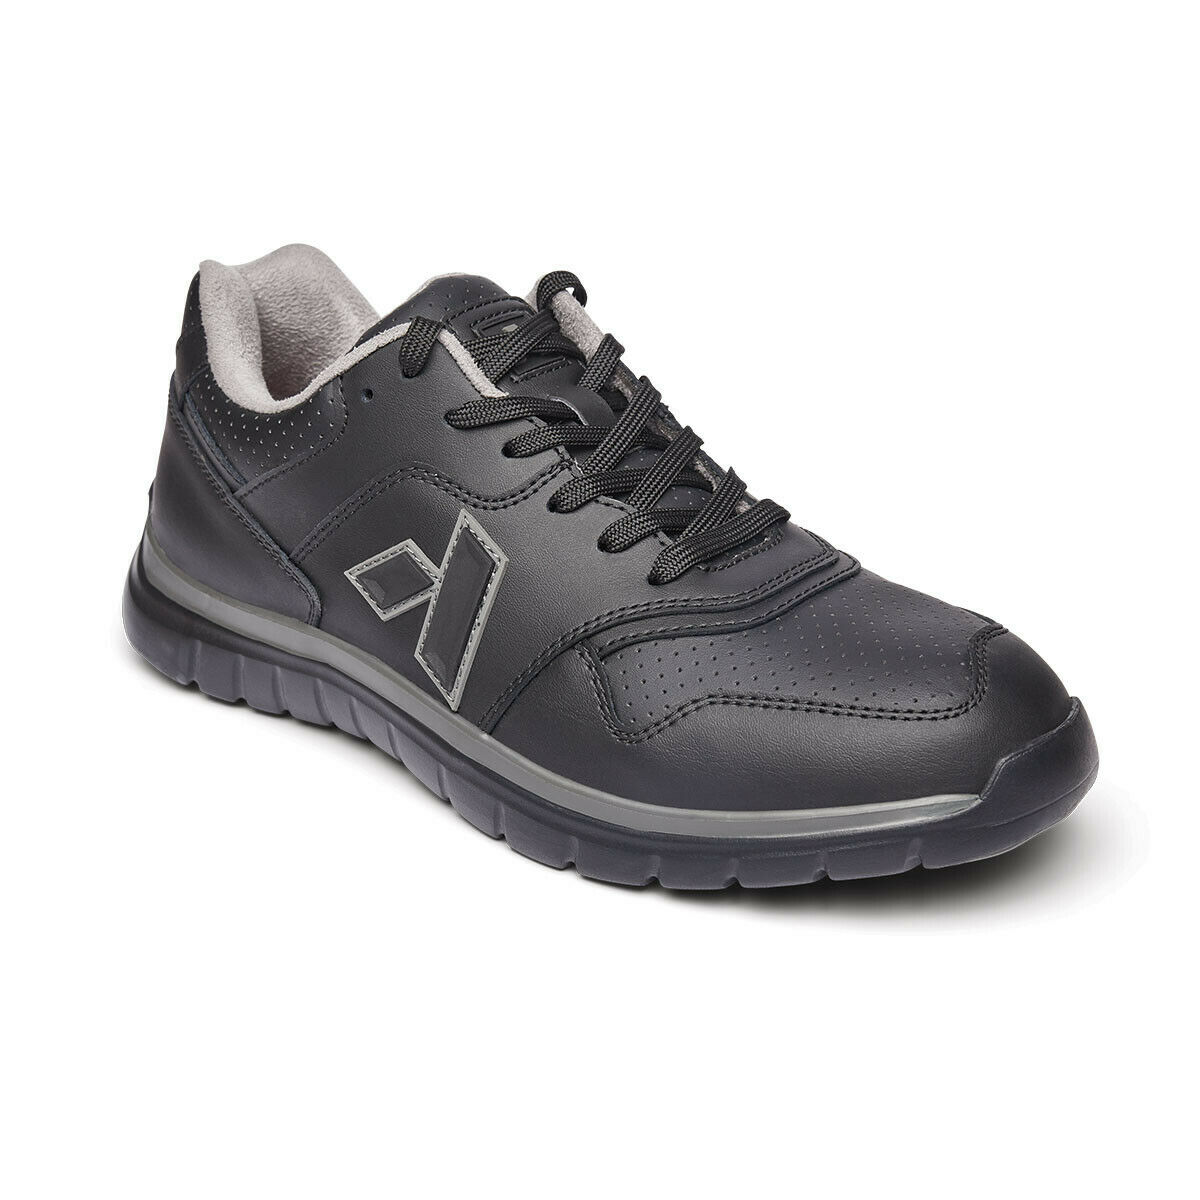 Anodyne No. 50 Sport Trainer Mens Shoes Black Diabetic Orthotic SALE